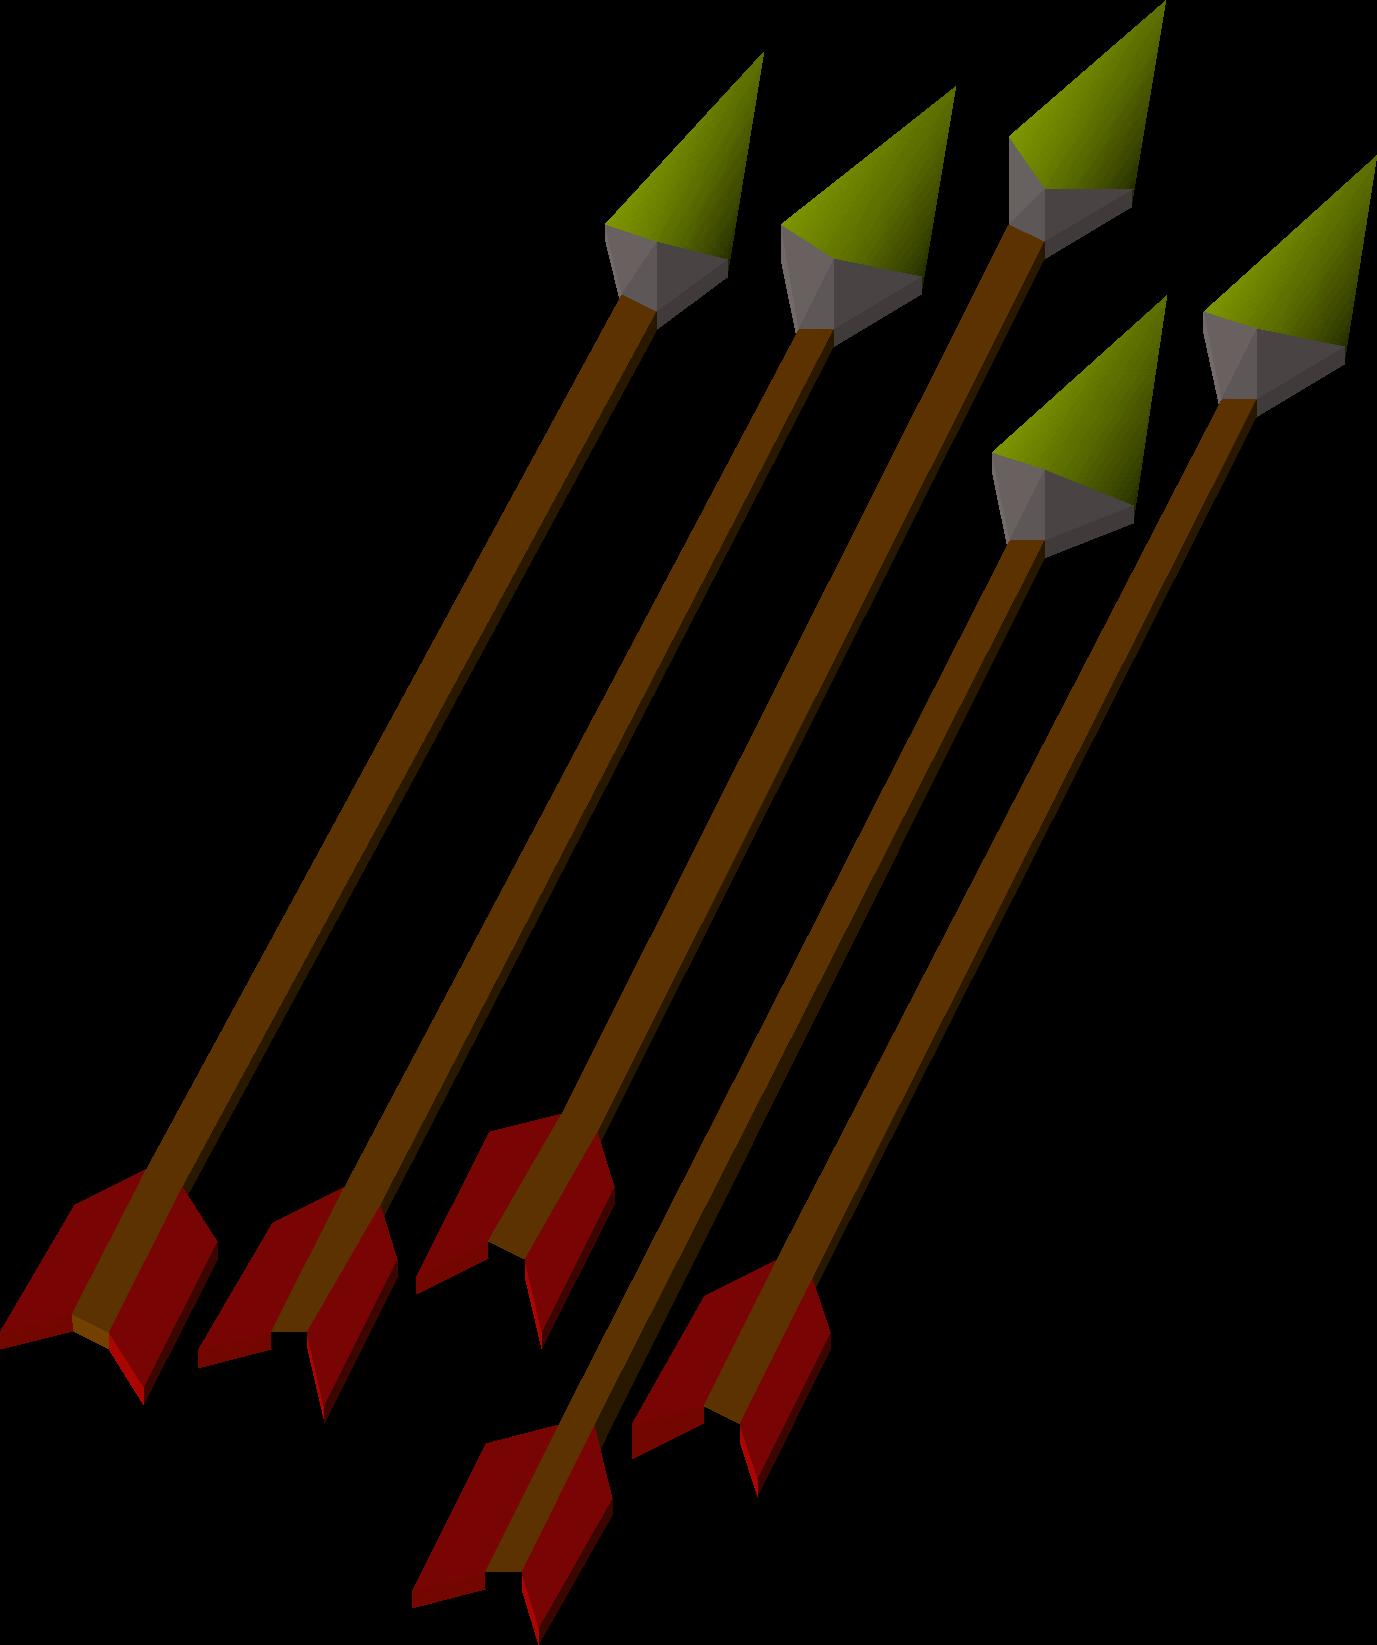 Iron, one of the best arrows in Old School RuneScape